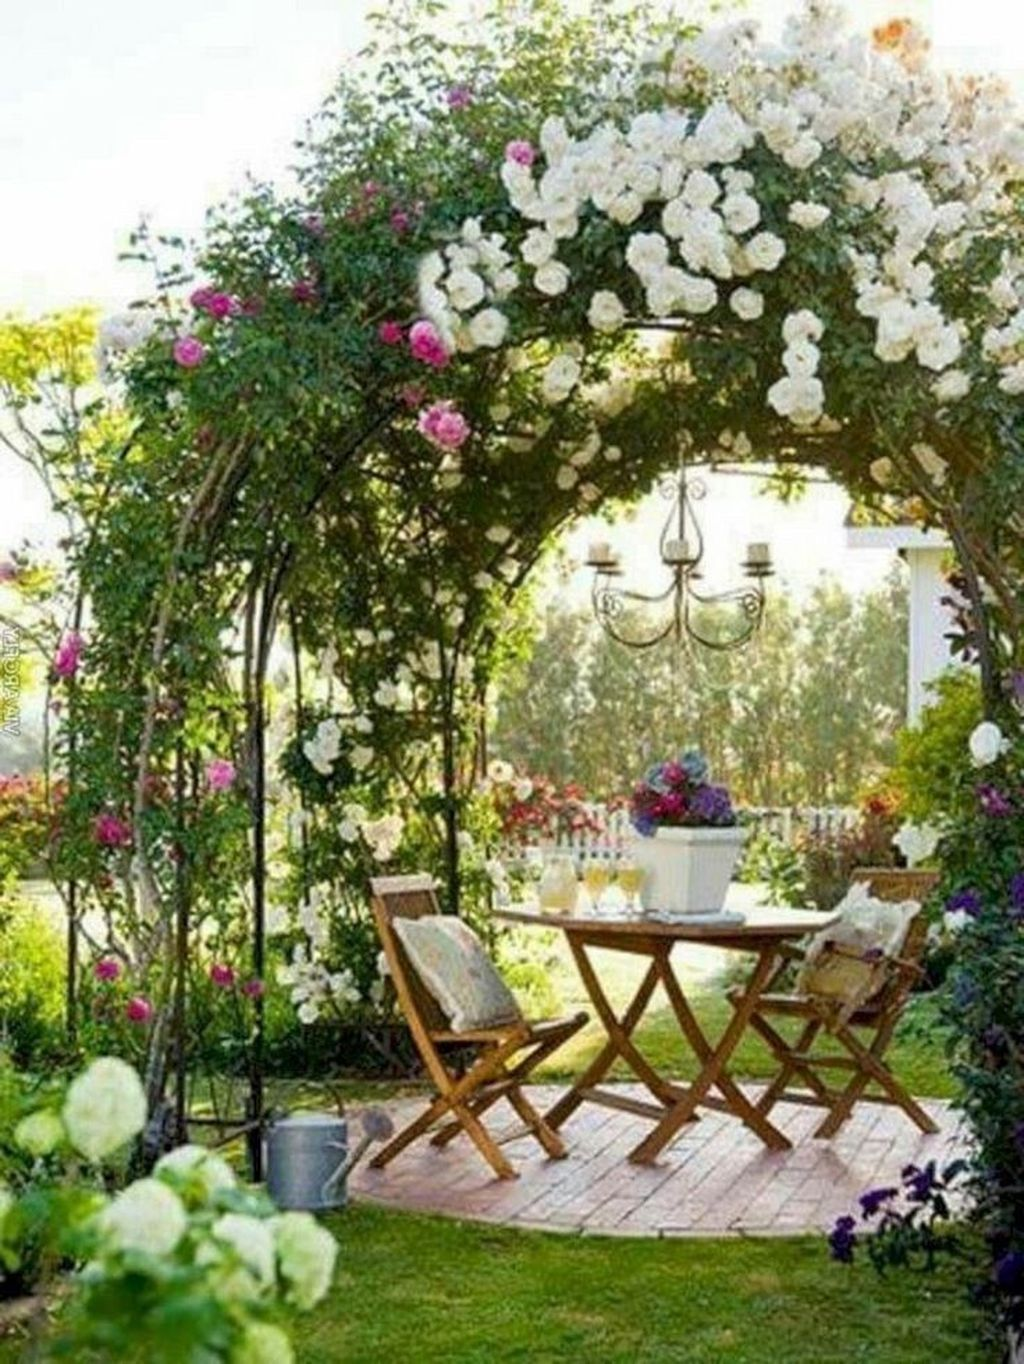 The Best Romantic Backyard Decorating Ideas 22